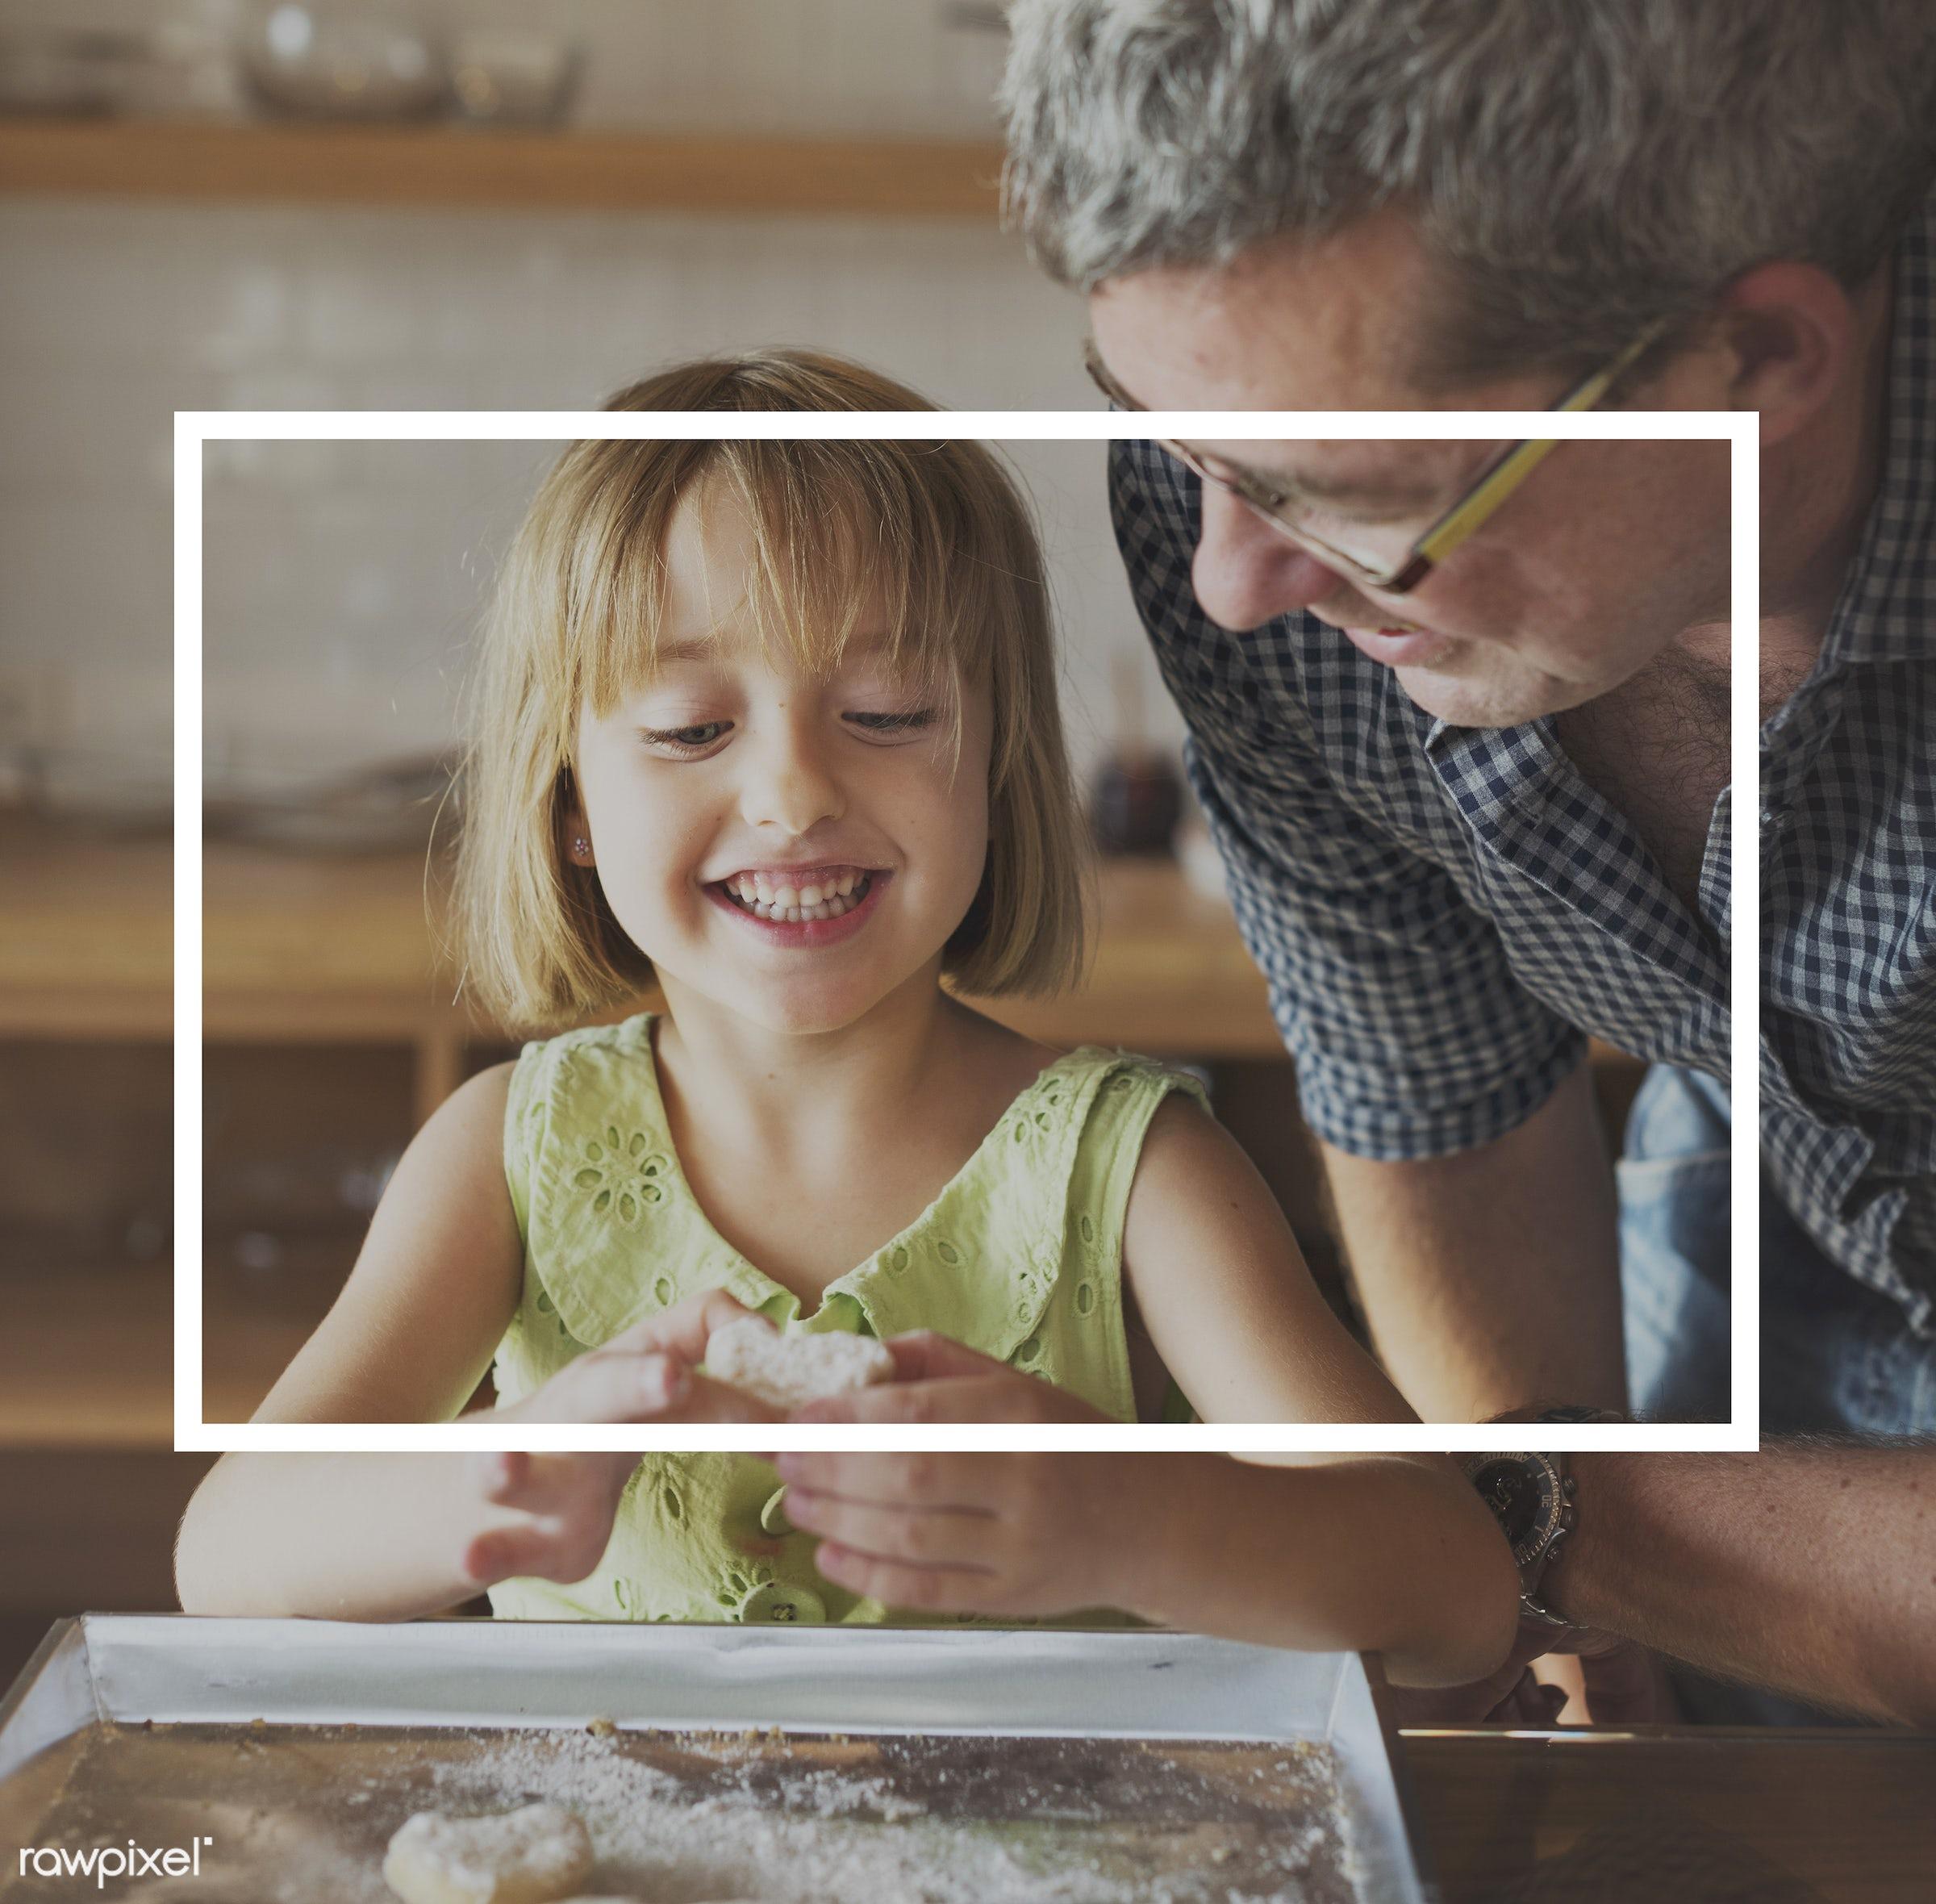 family, badge, bake, baking, blank, bonding, brand, cheerful, childhood, cookies, copy space, cute, design, empty, enjoy,...